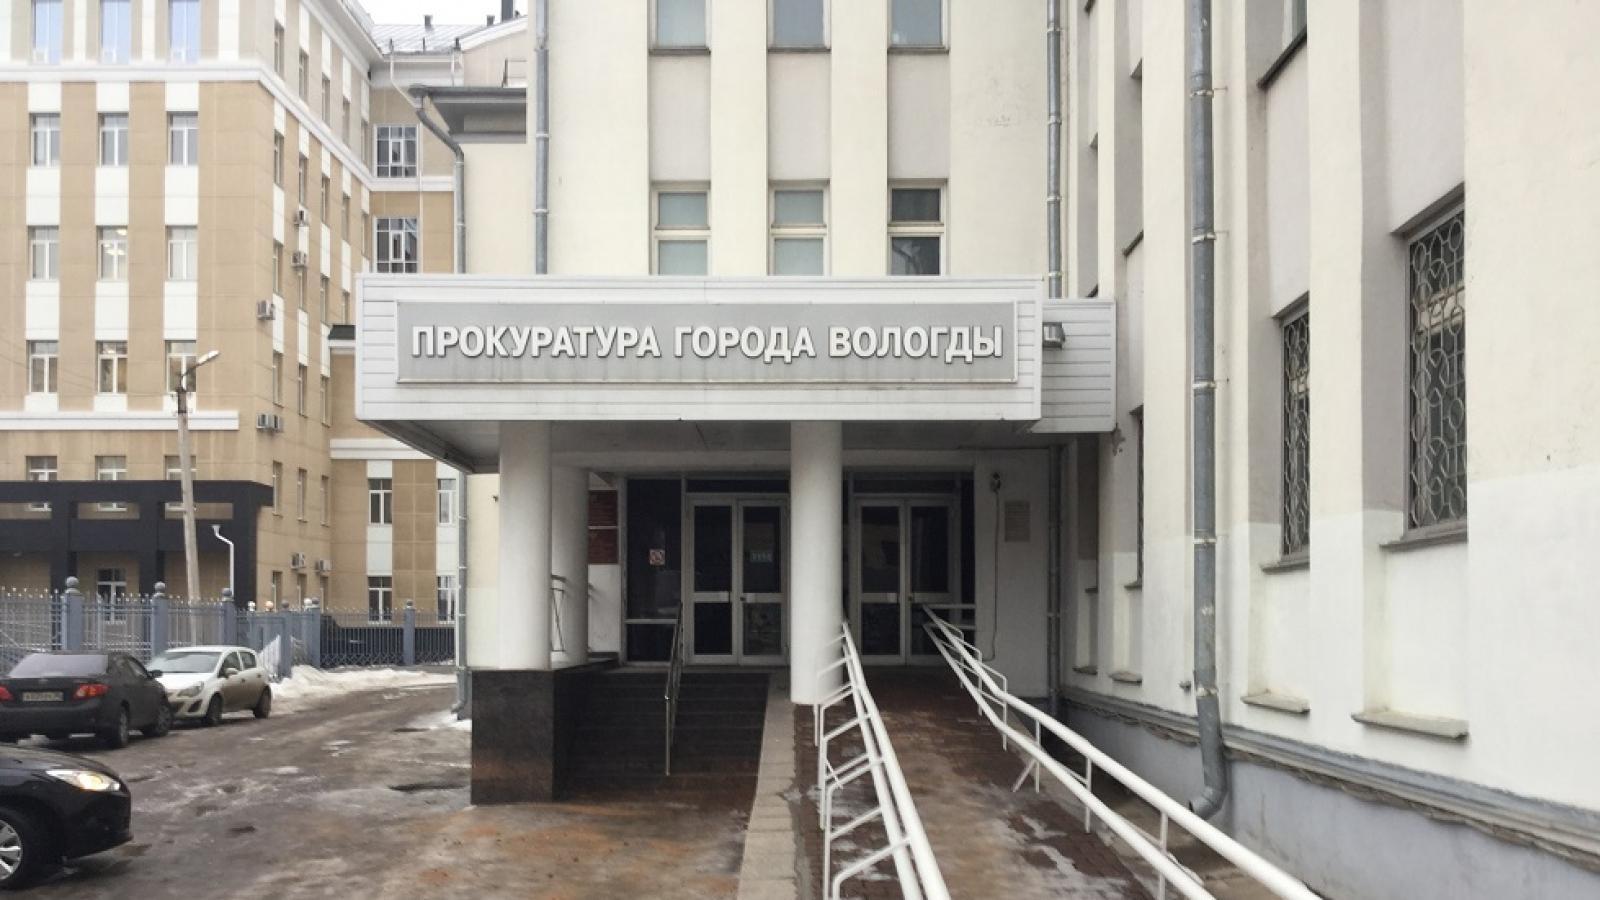 Прокуратура примет пострадавших от паводка вологжан